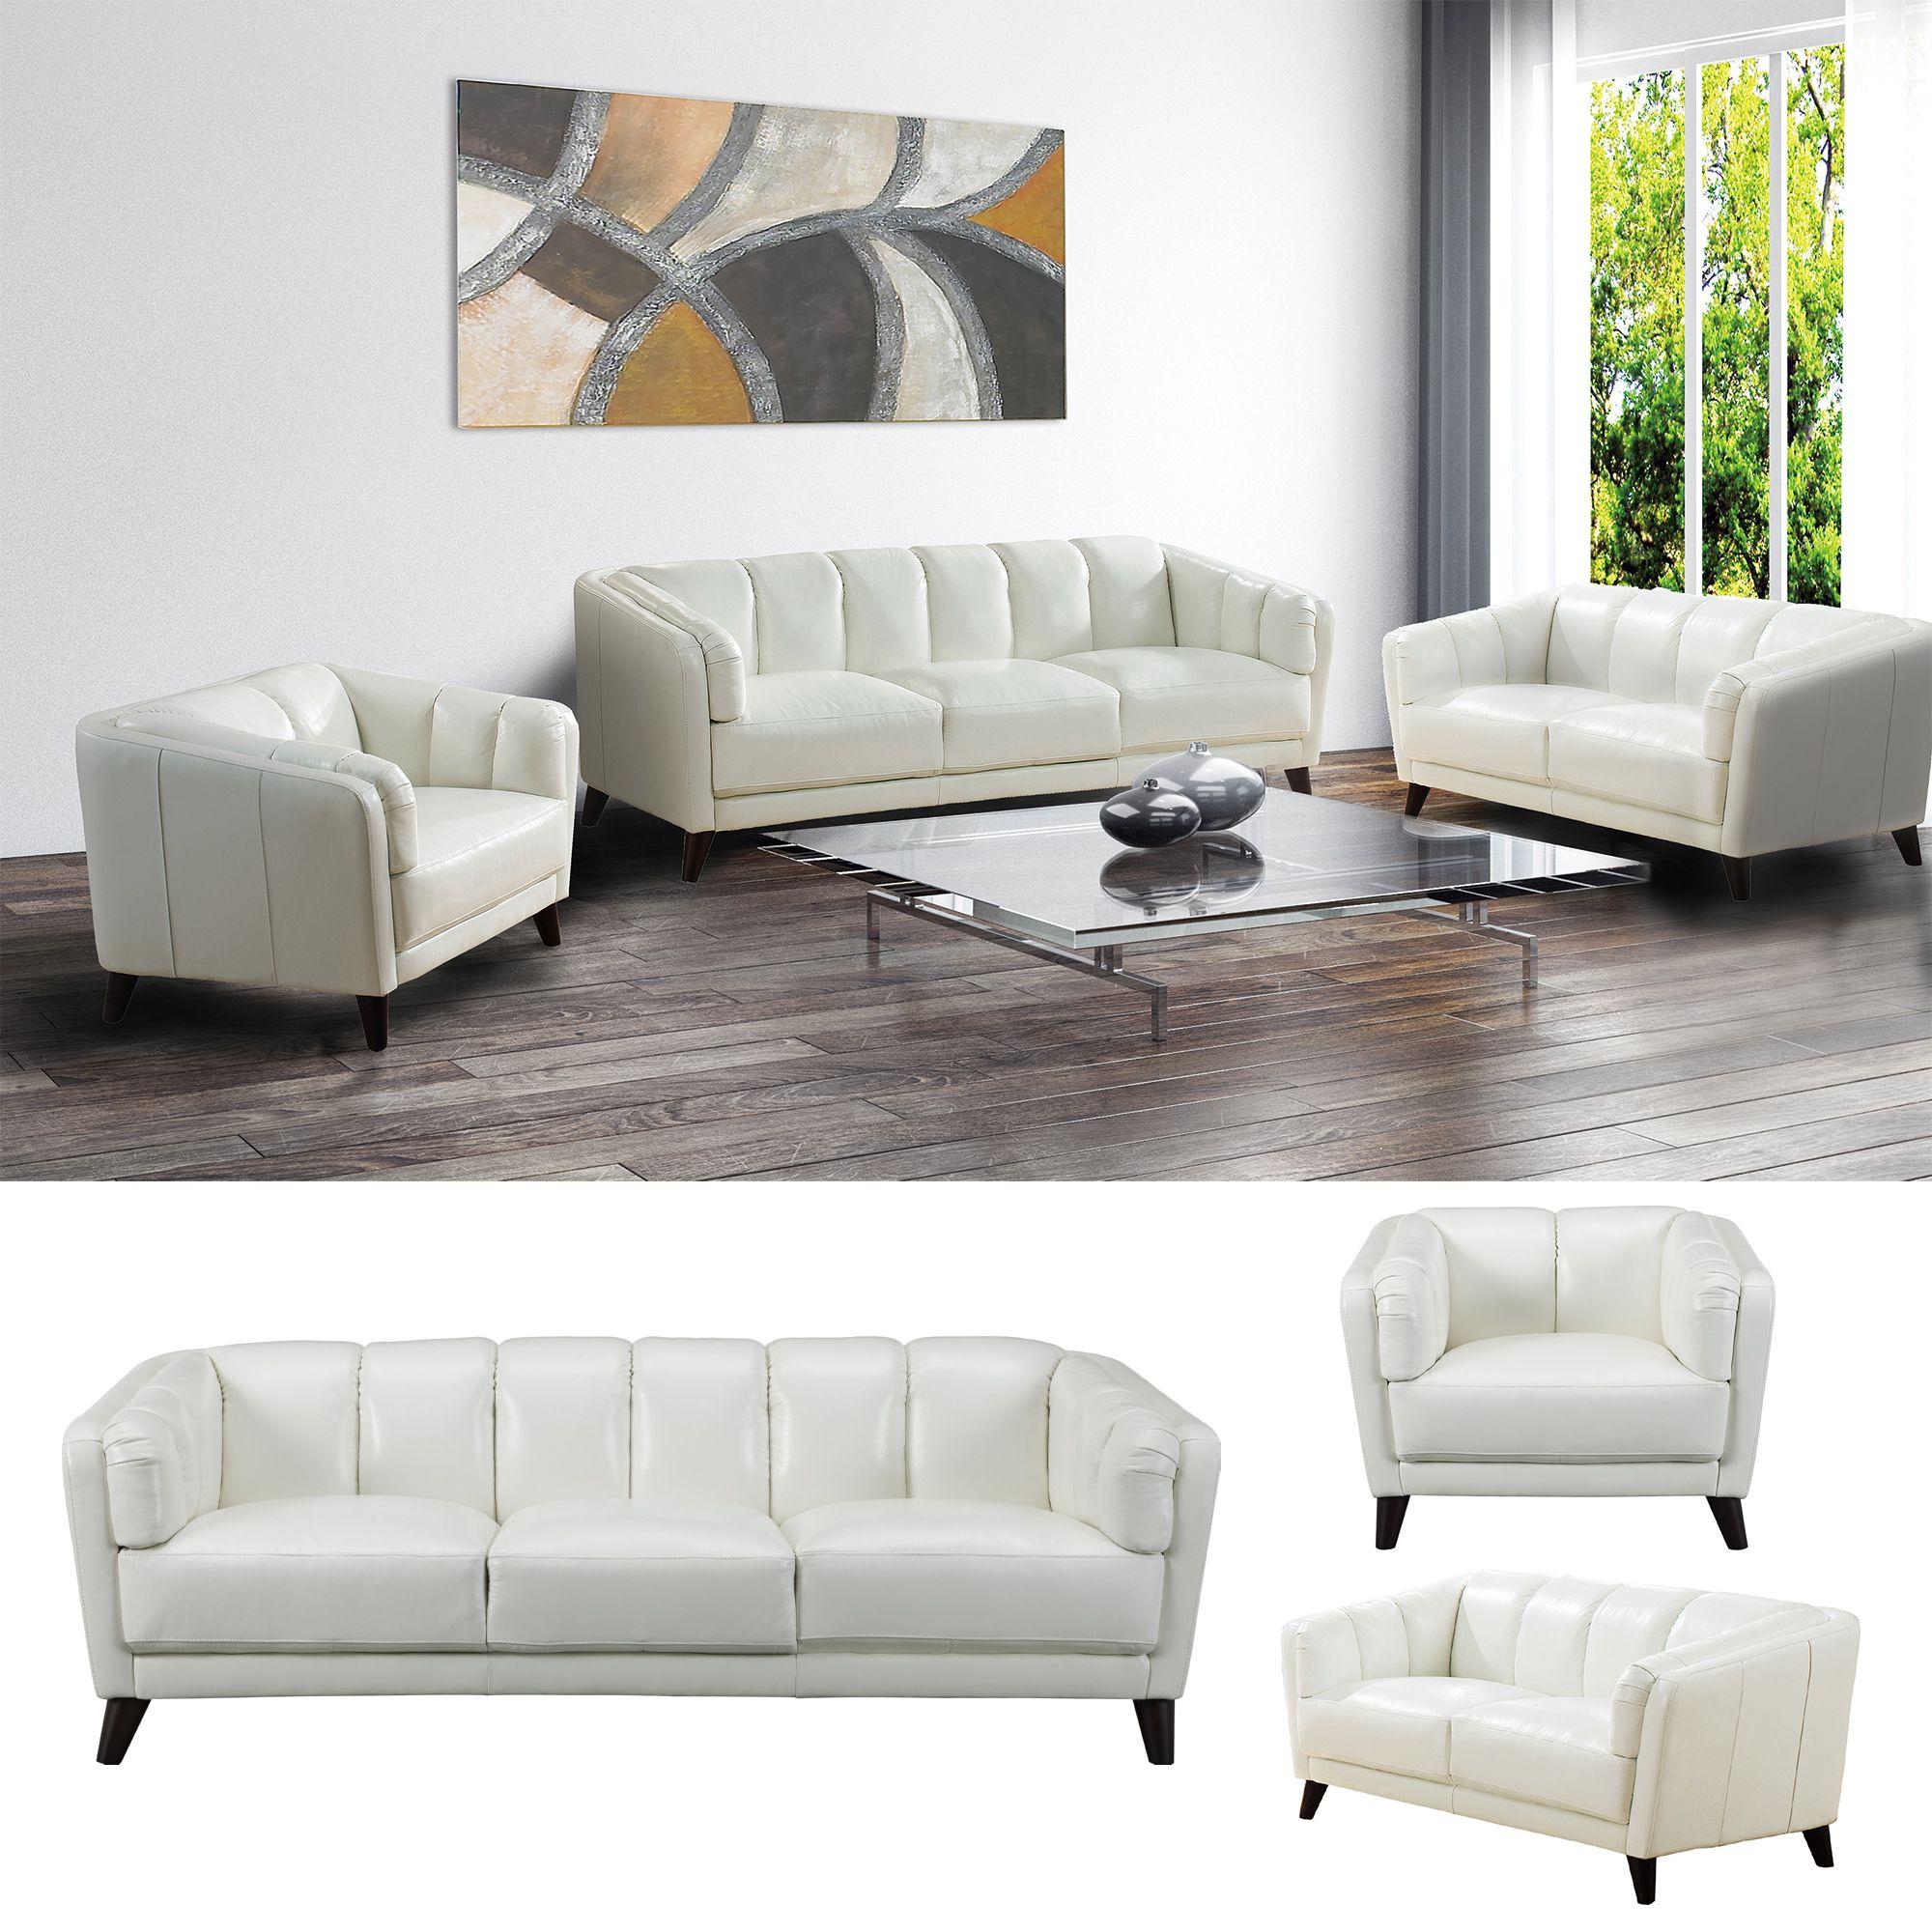 Leathercraft Sofa Design Inspiration The Most New House Furniture Rh  Auroranightout Com